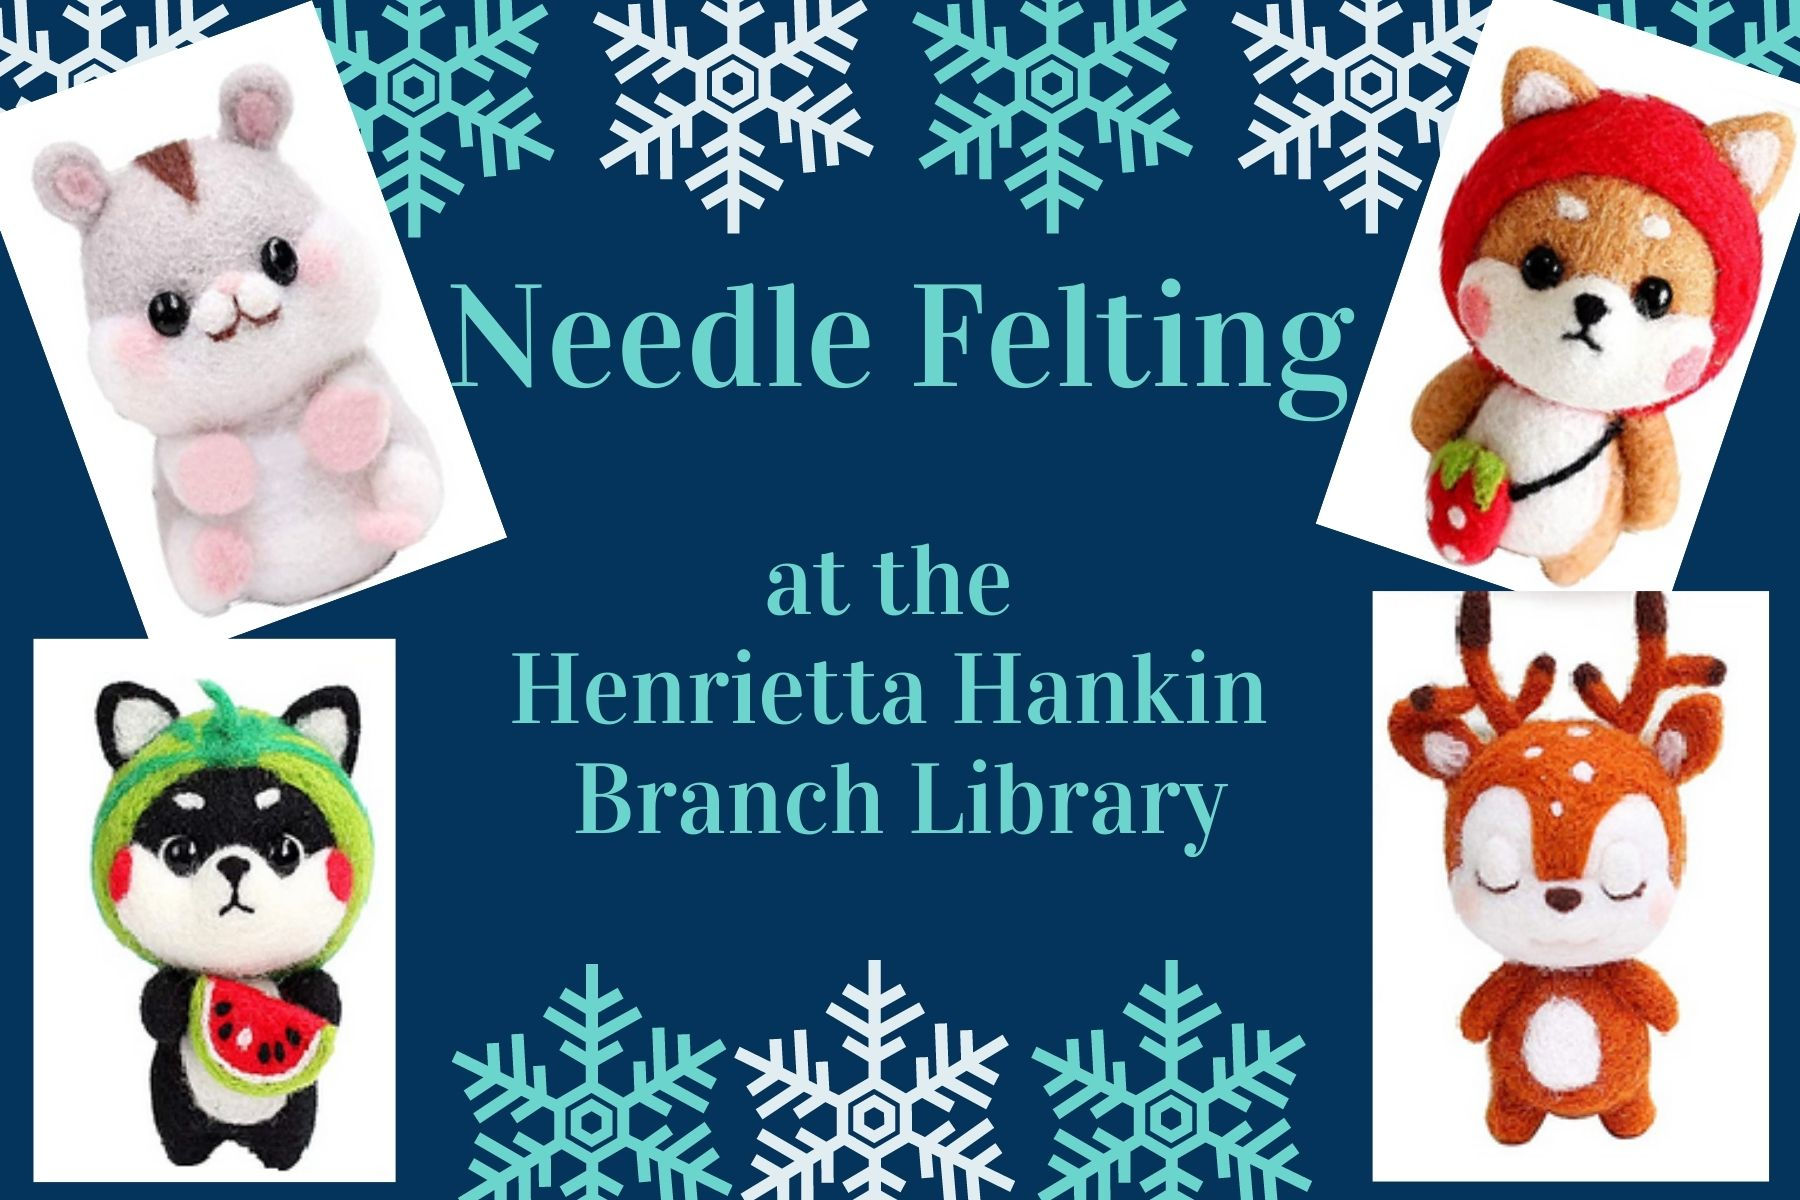 Virtual: Needle Felting (new creatures!)